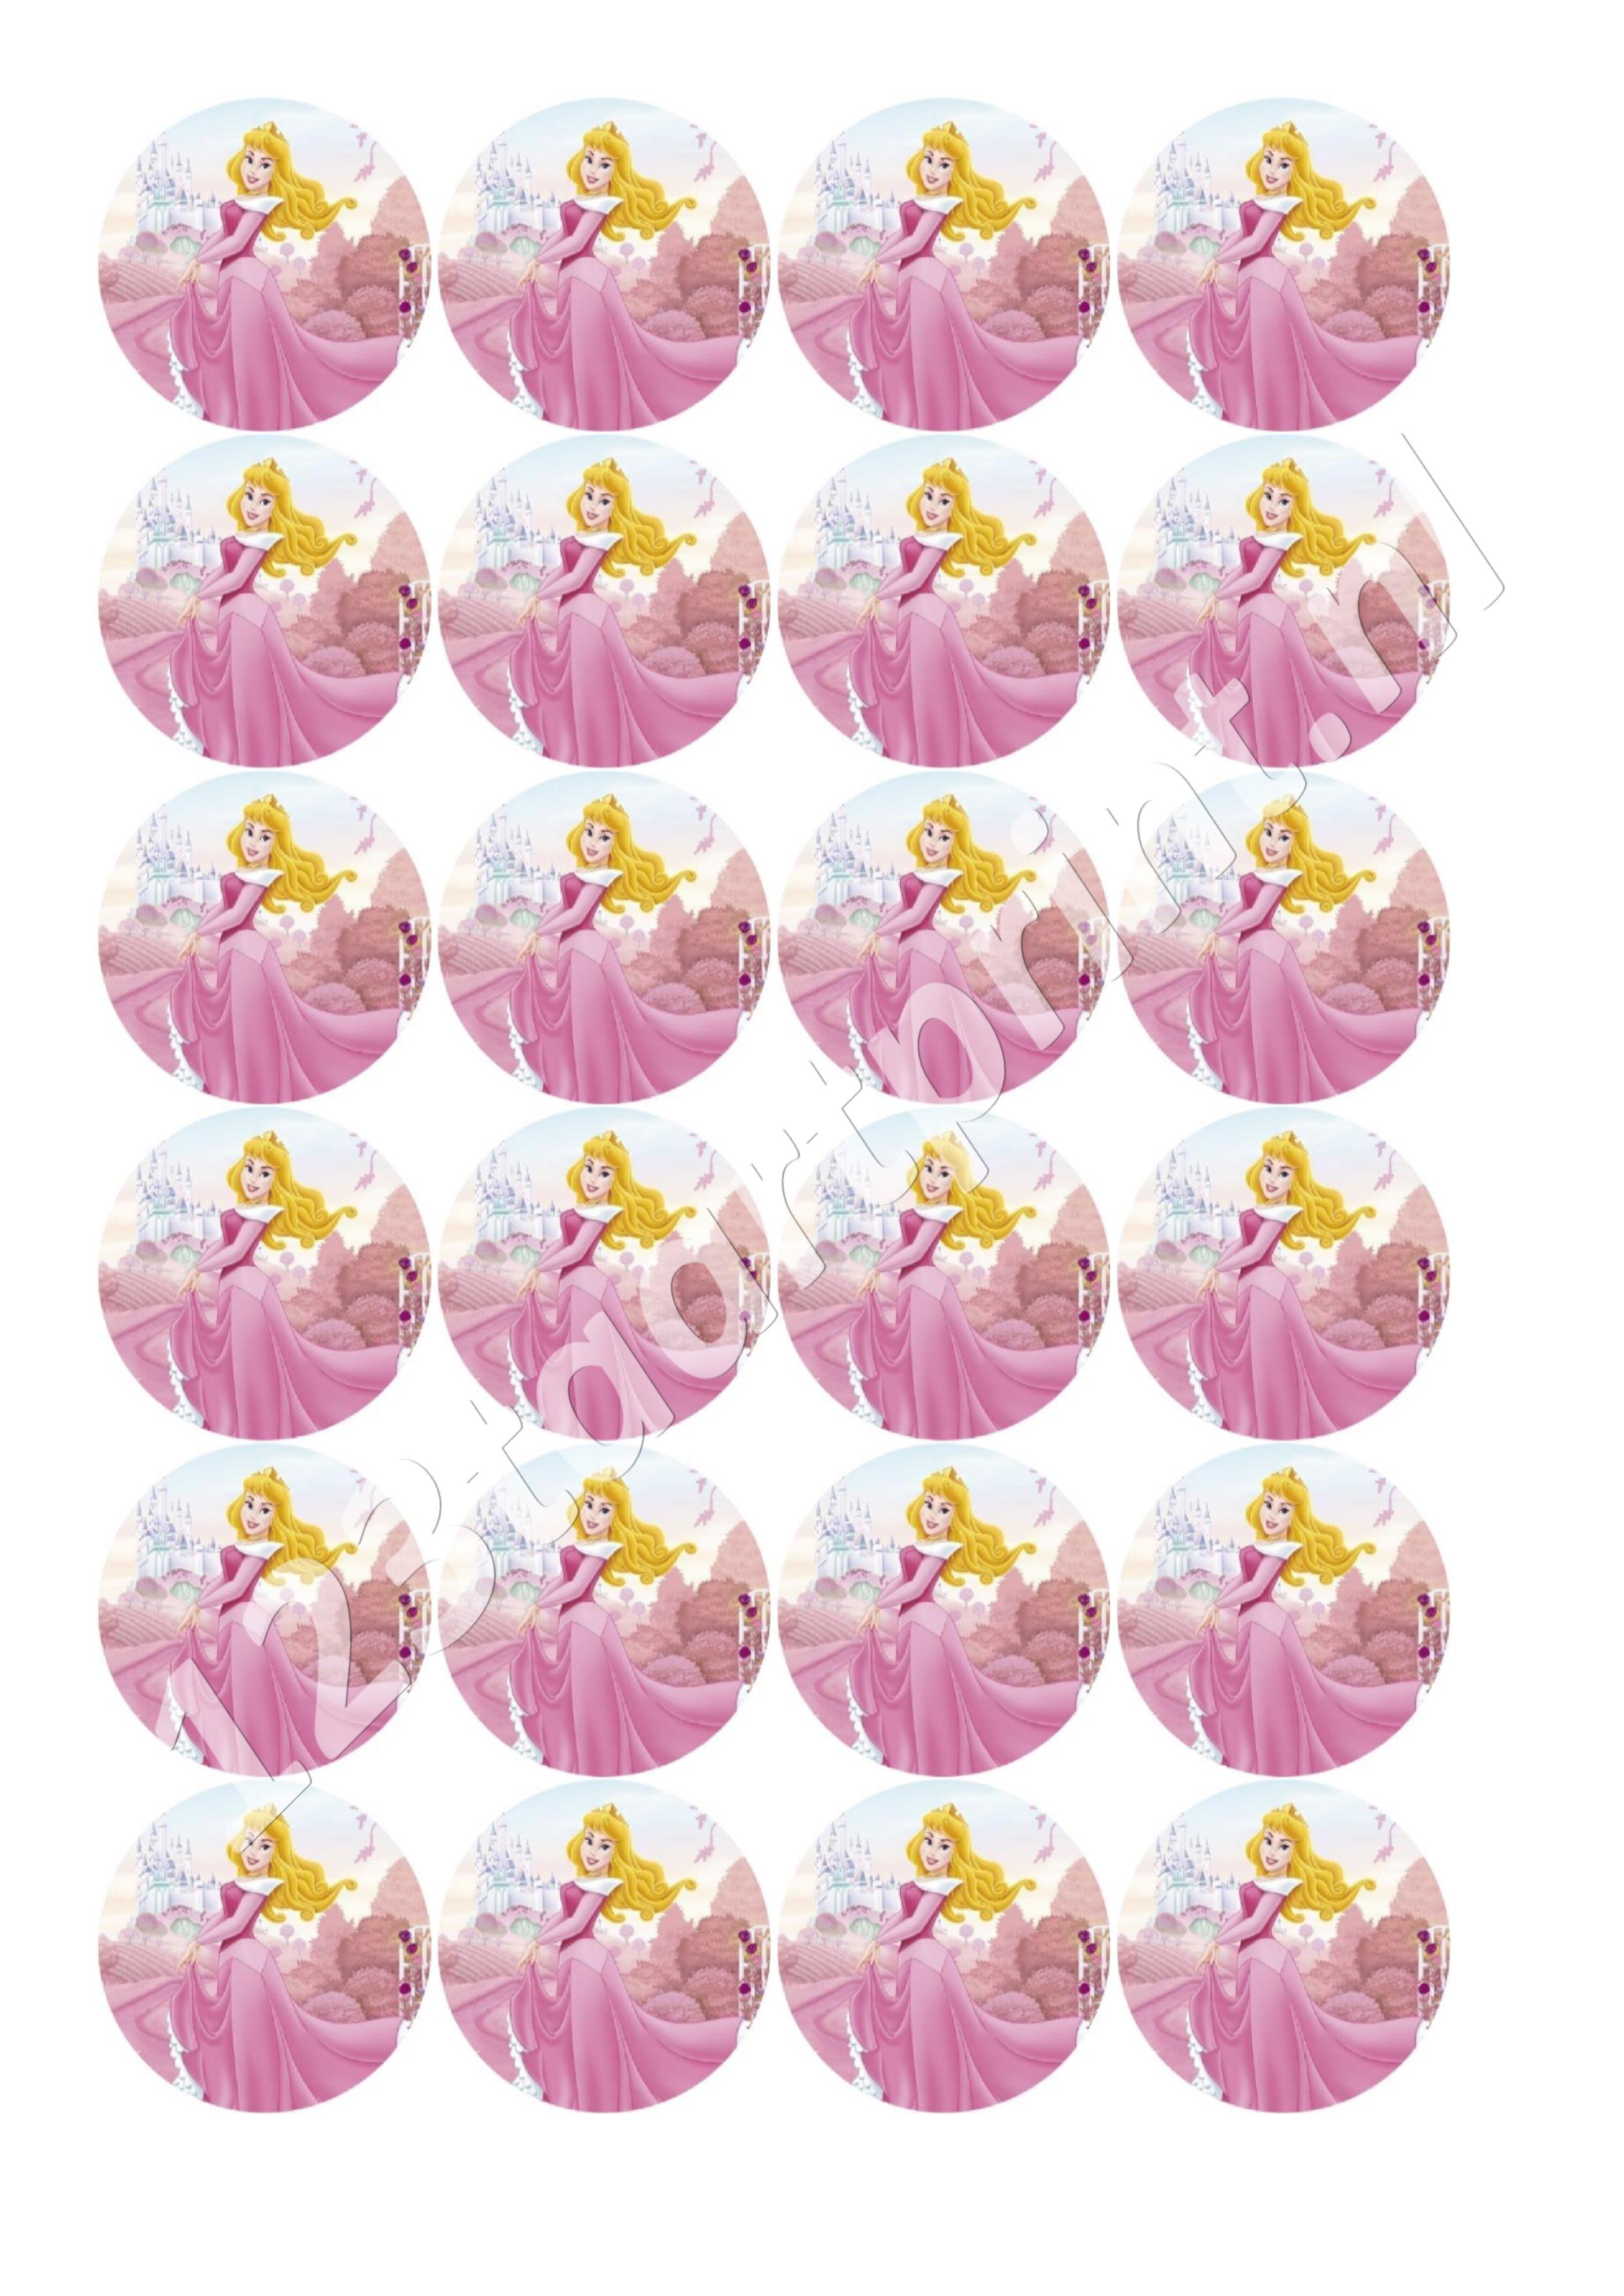 Doornroosje cupcakes